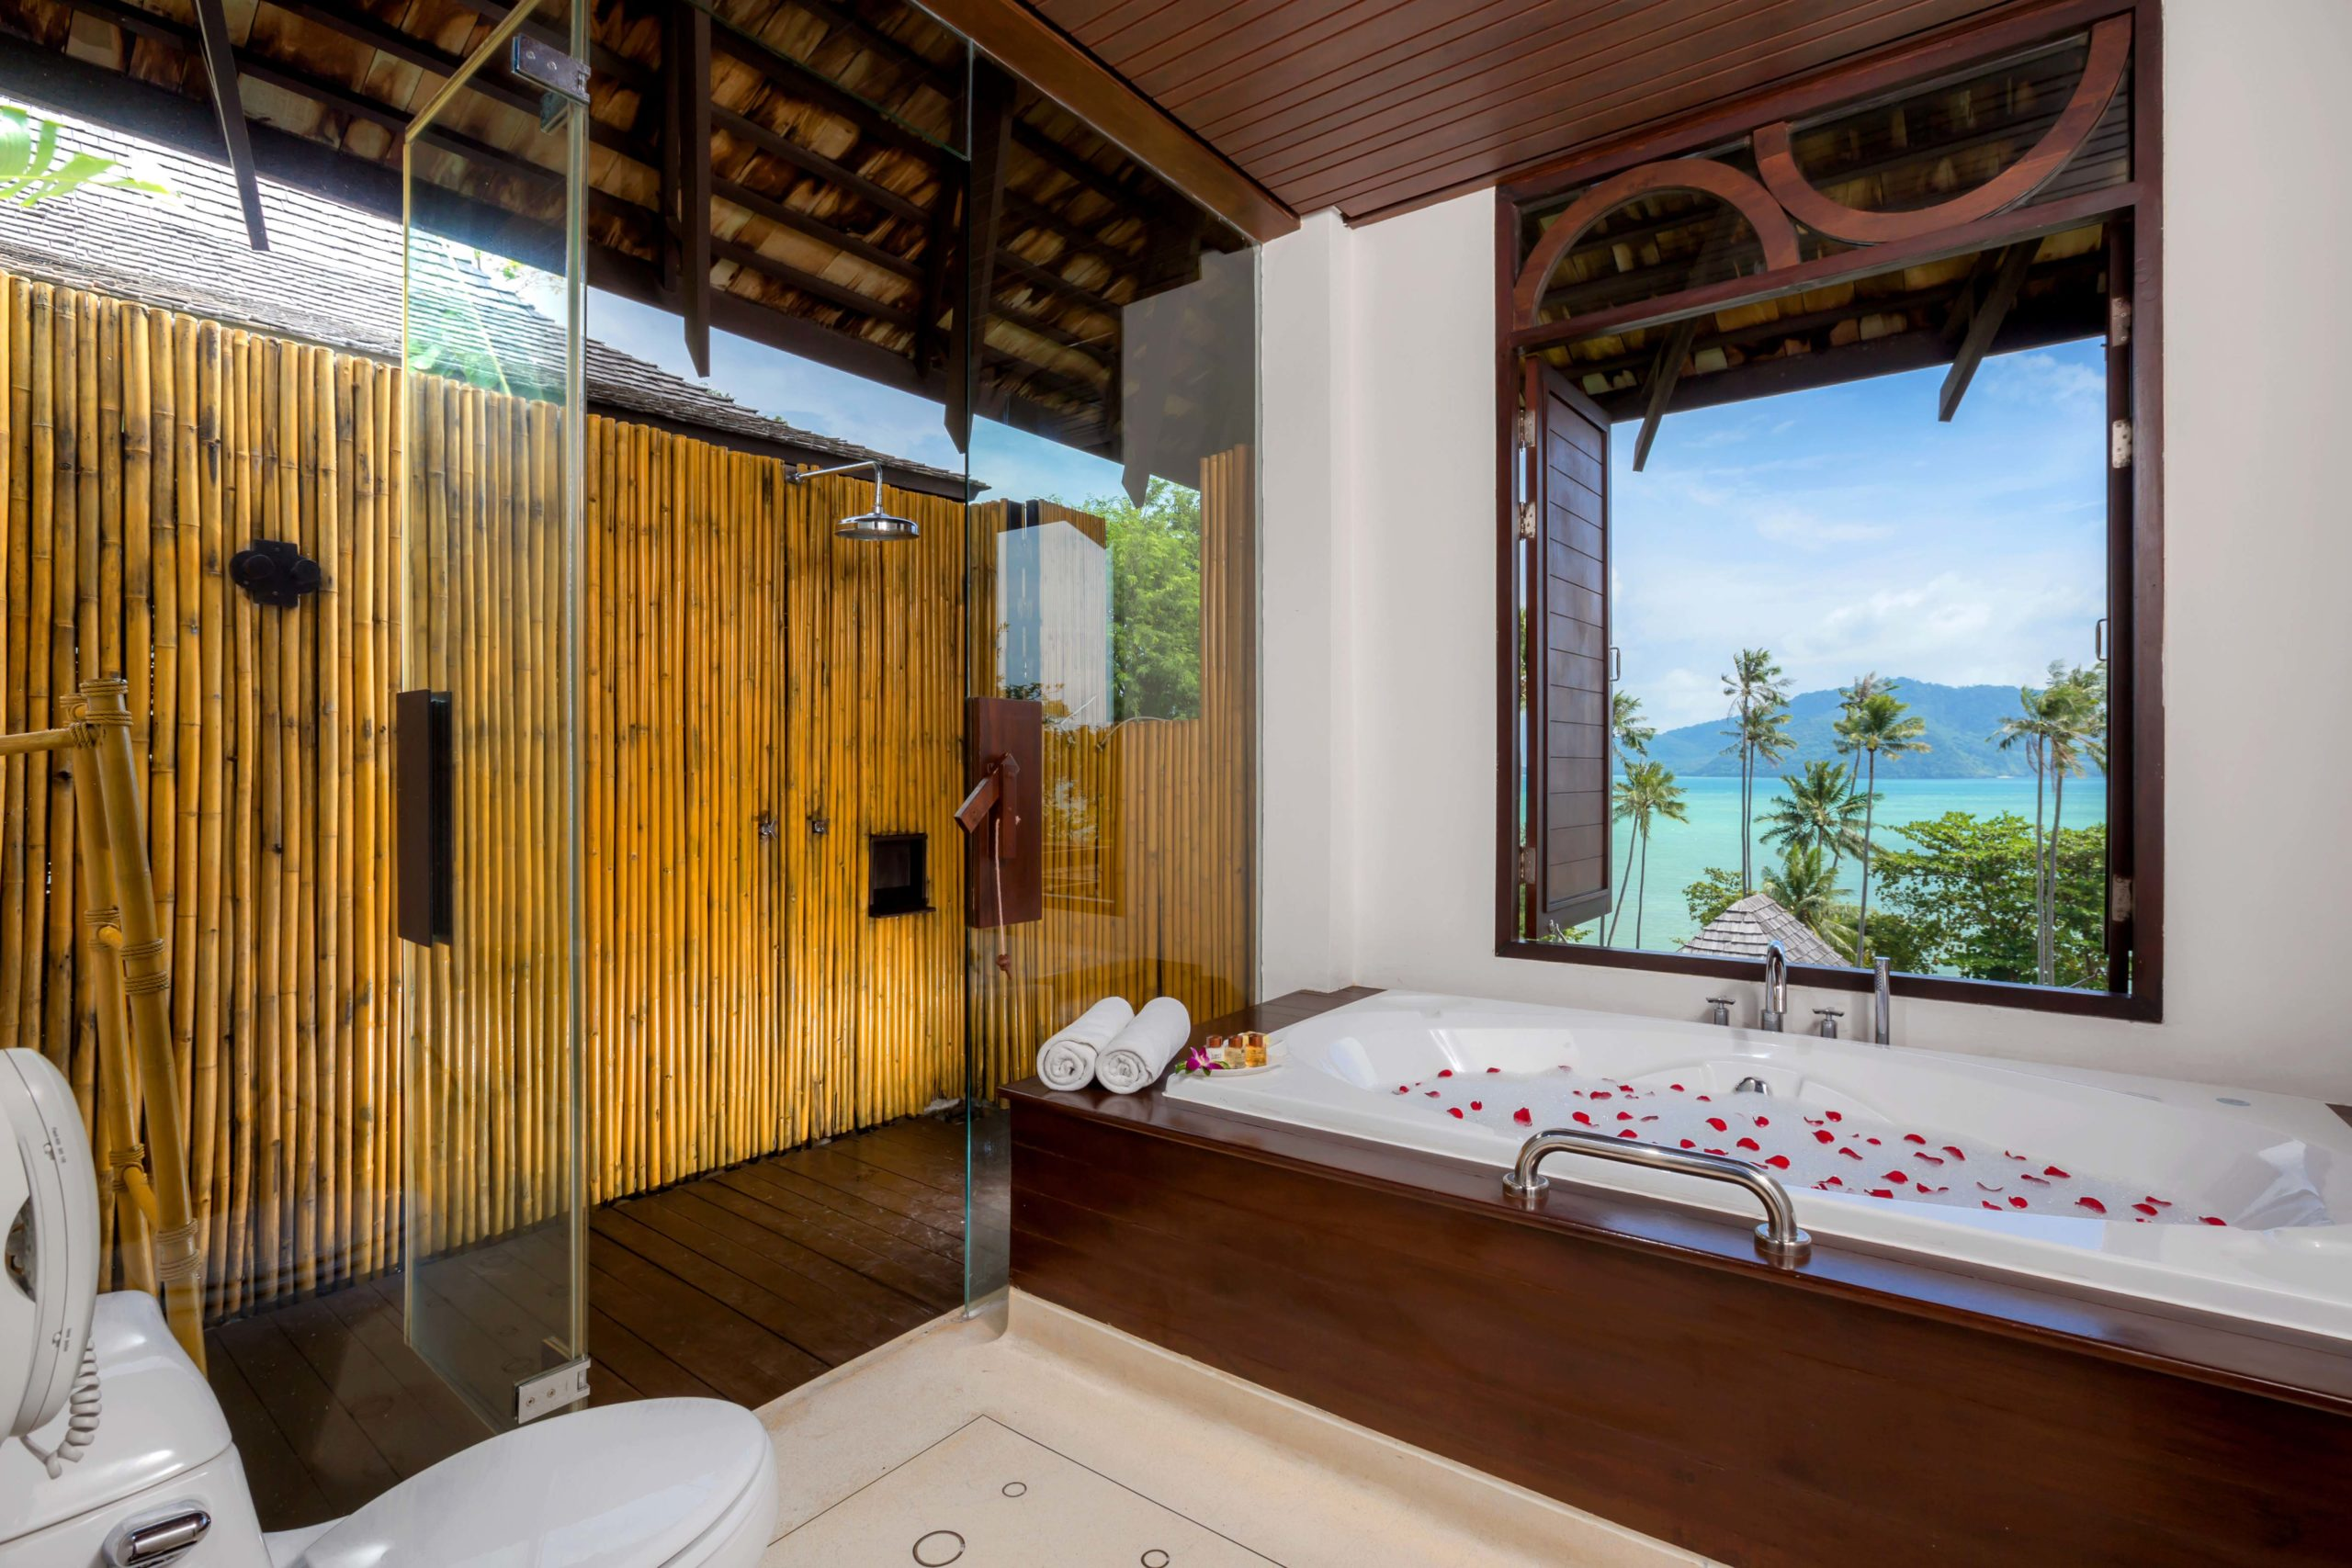 005_Deluxe Seaview Villa_Bathroom The Vijitt Resort Phuket